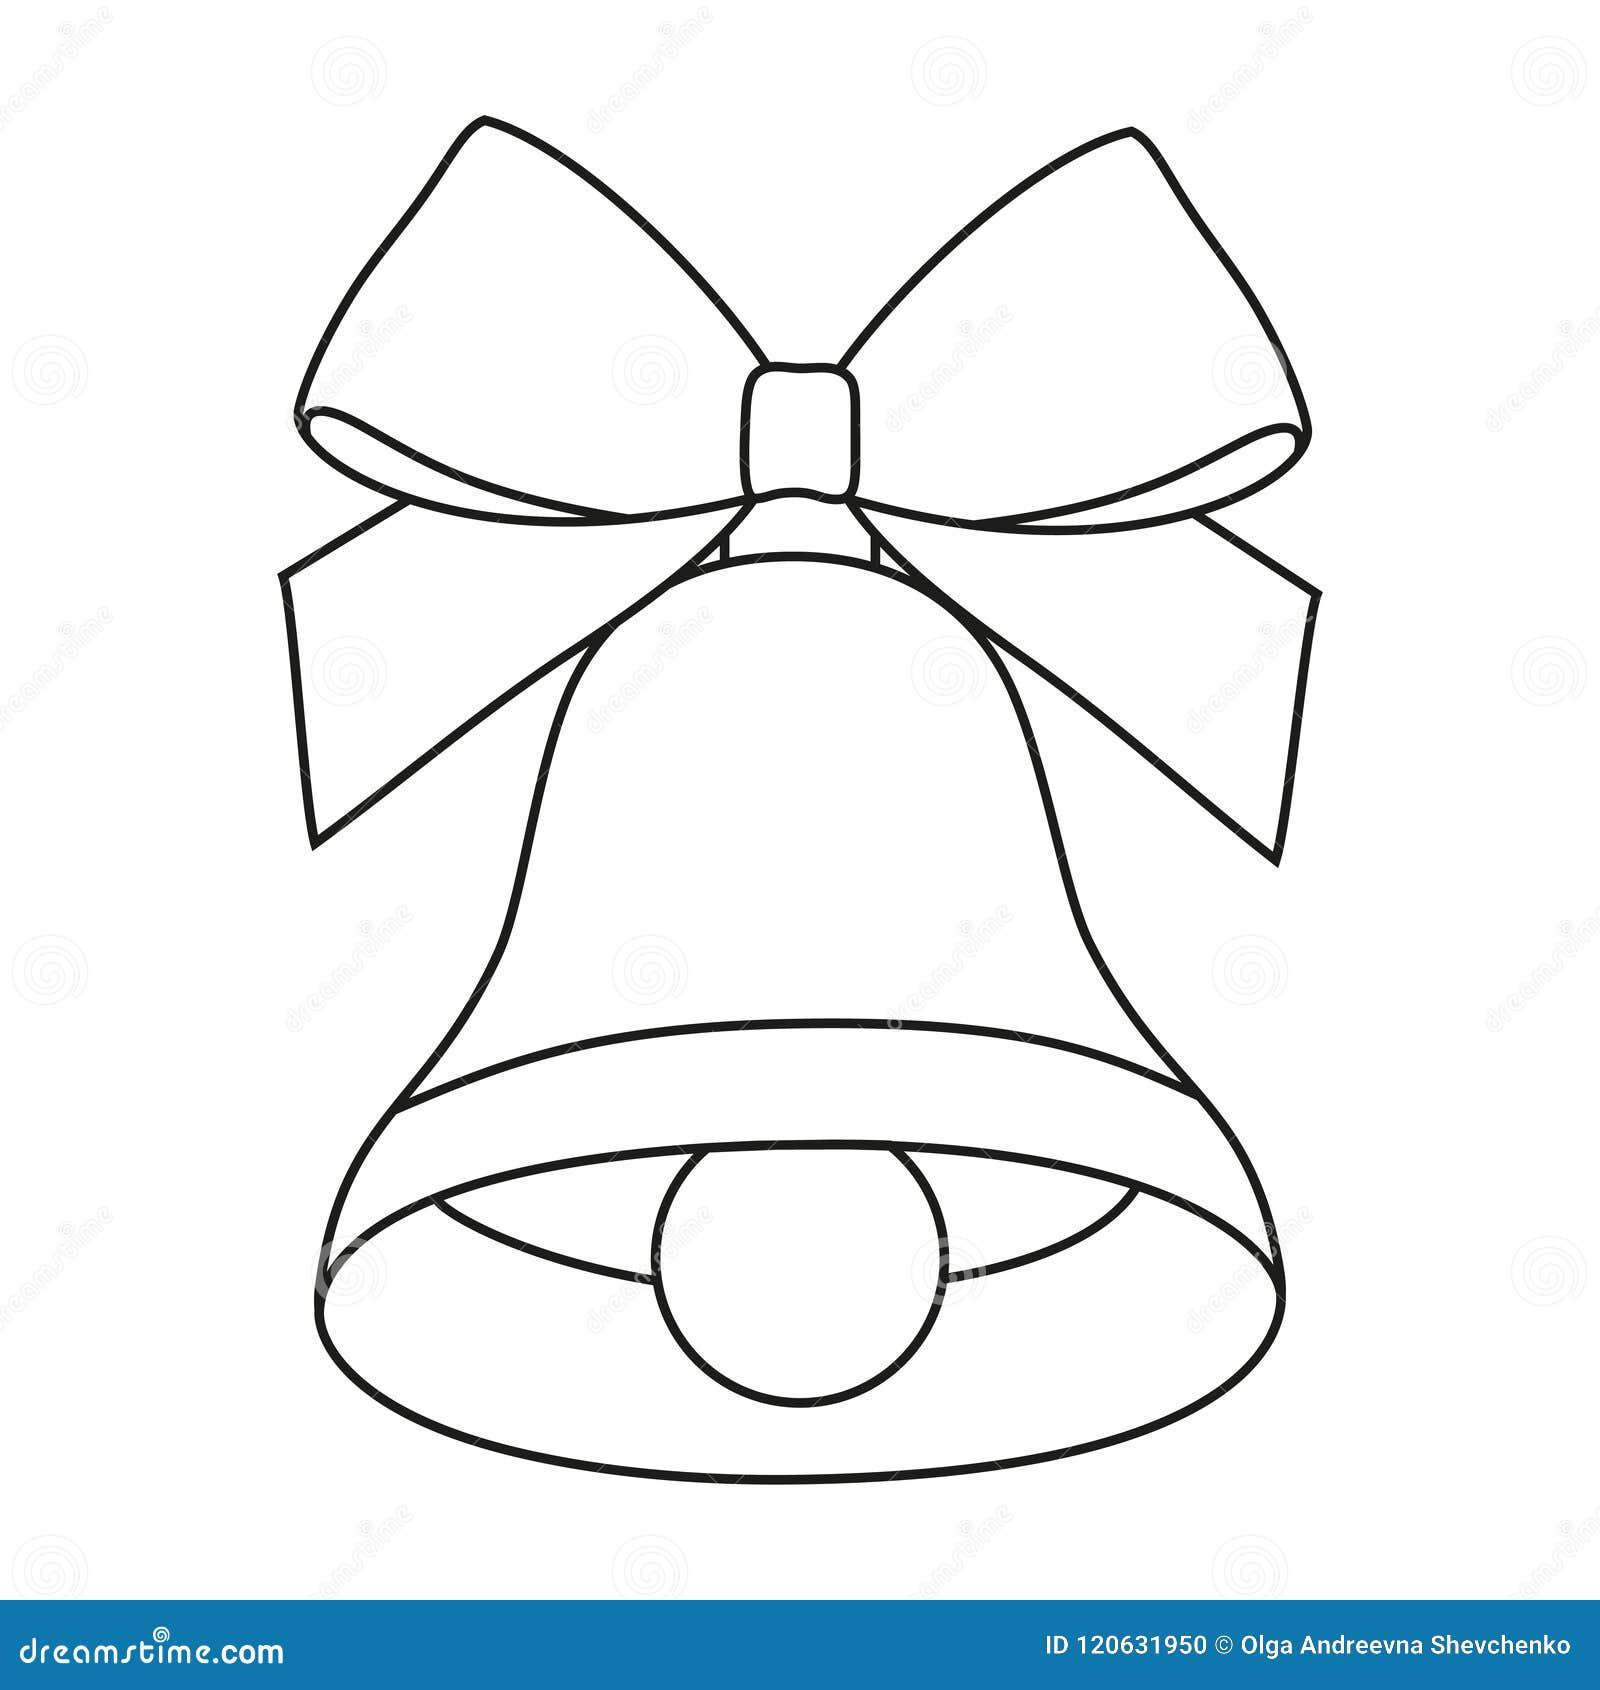 line art black and white bell